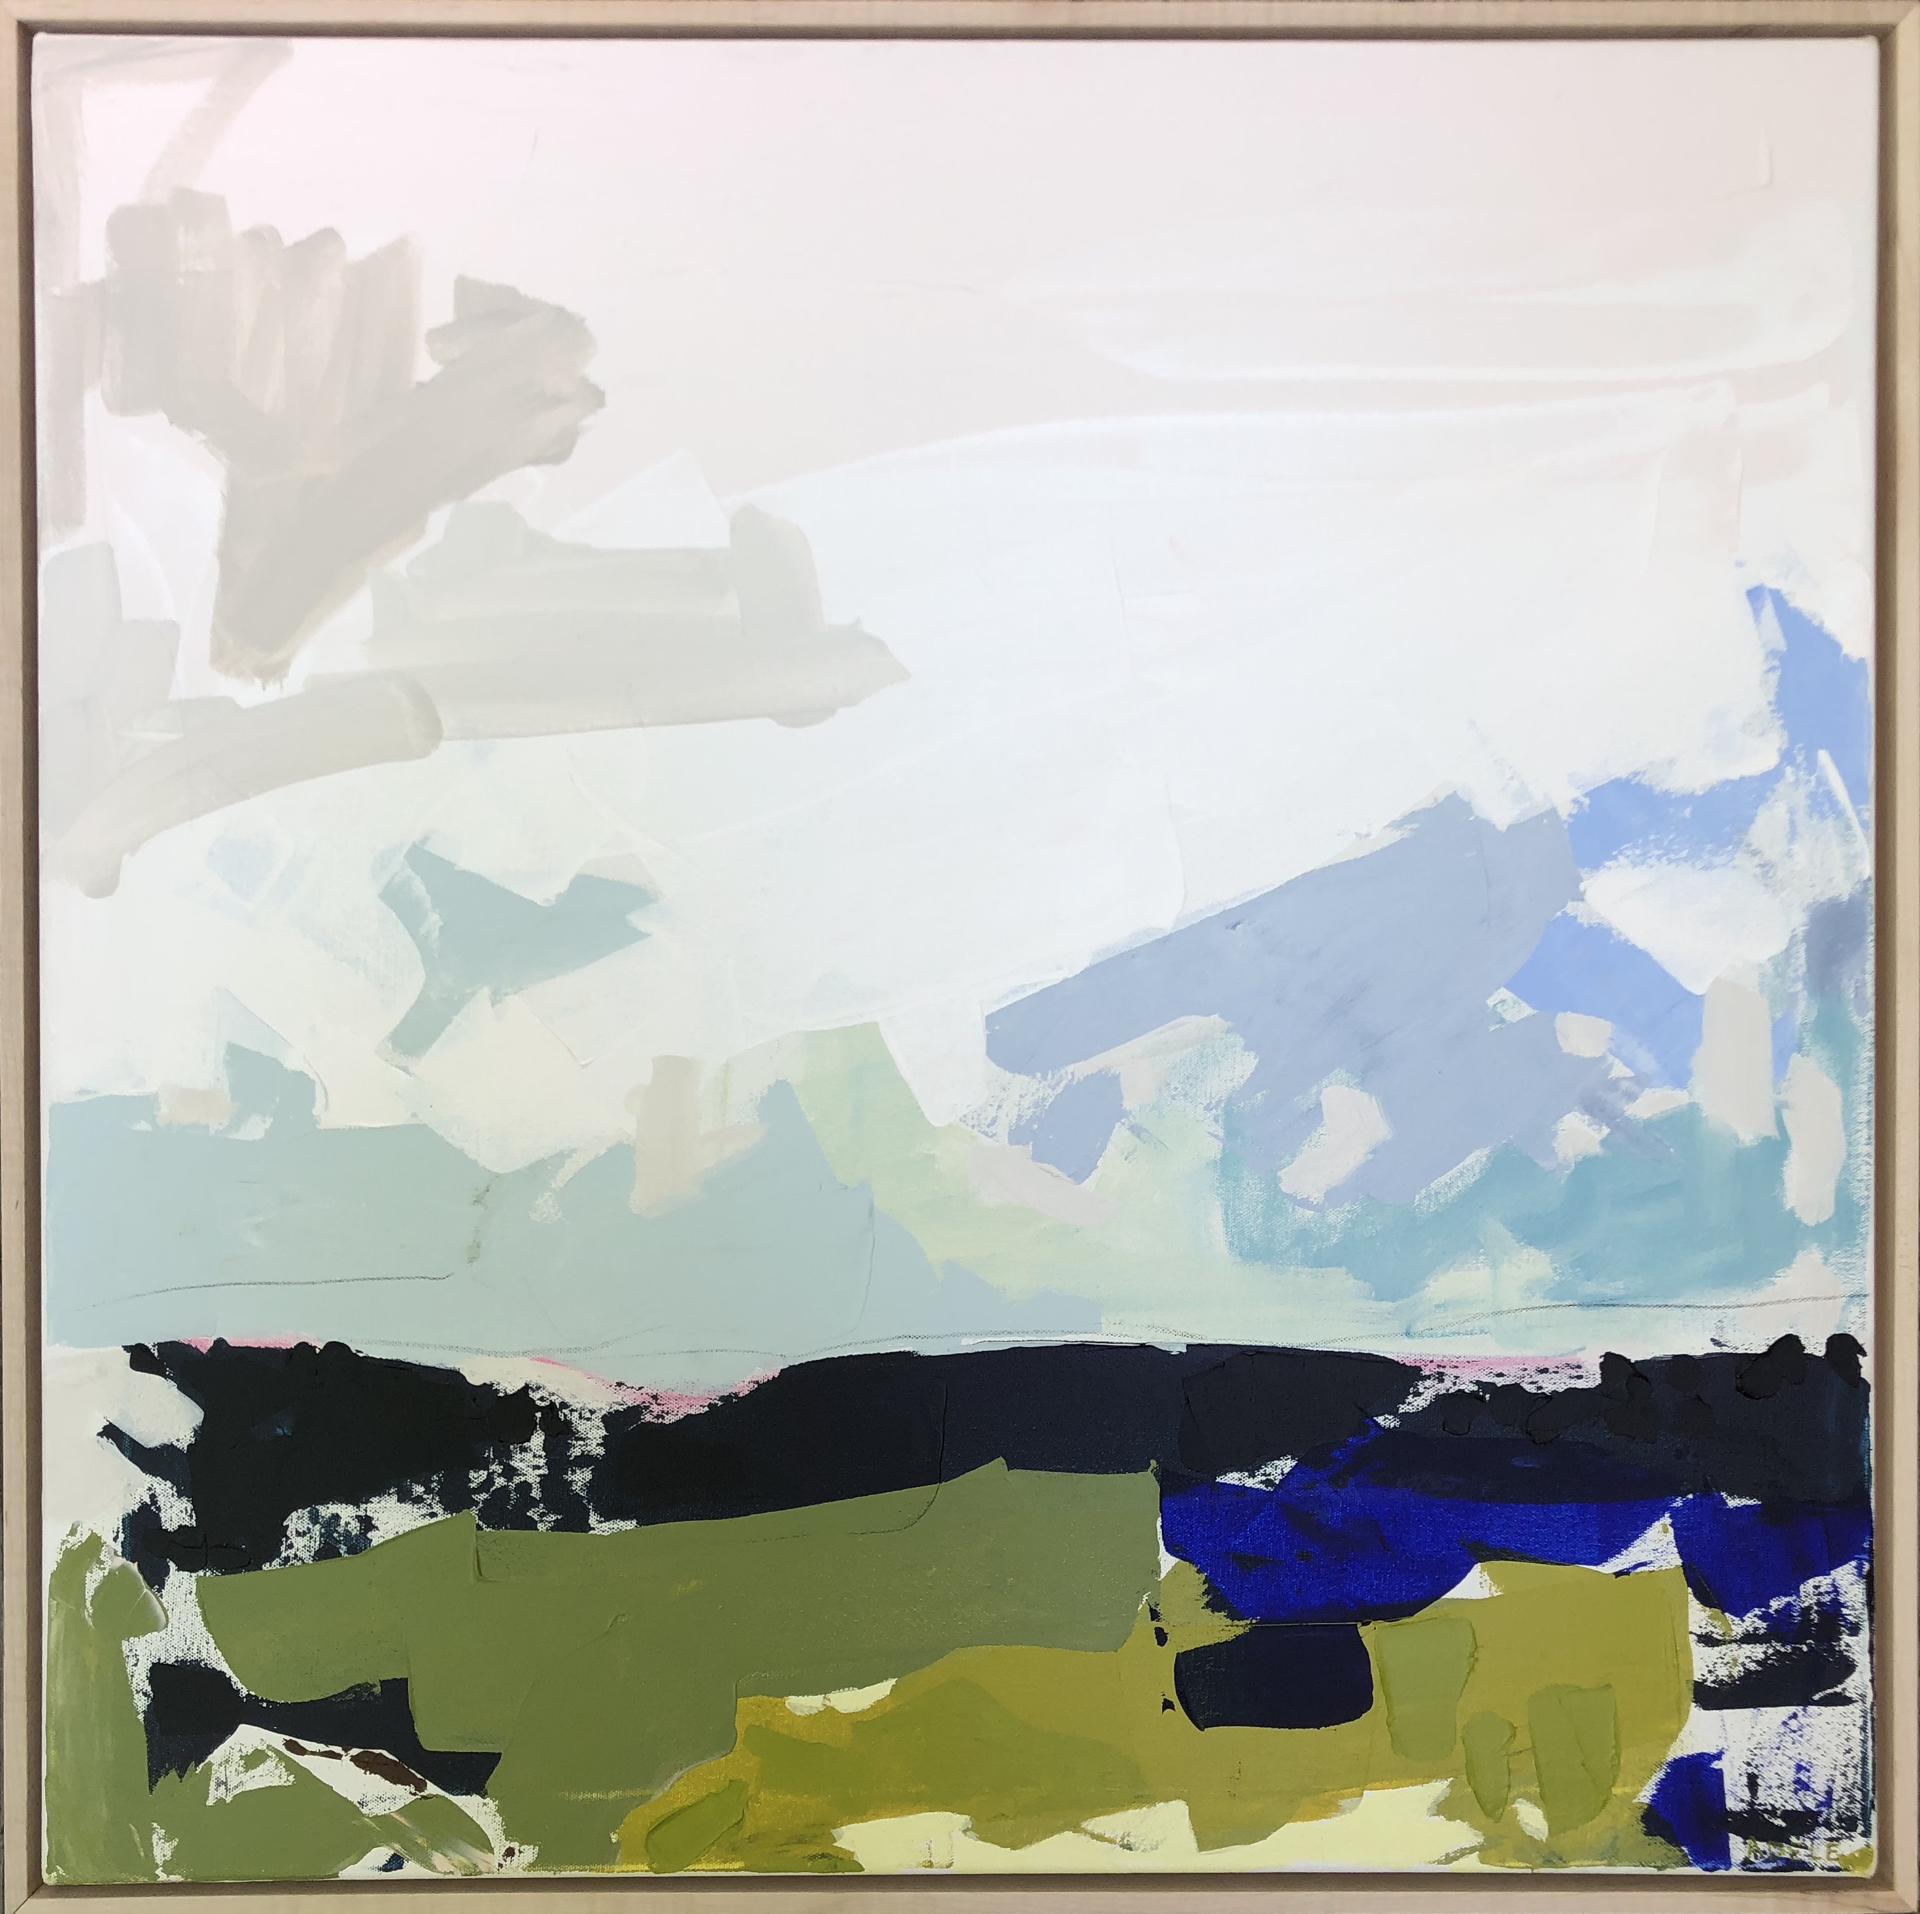 Unyielding  by Adele Yonchak